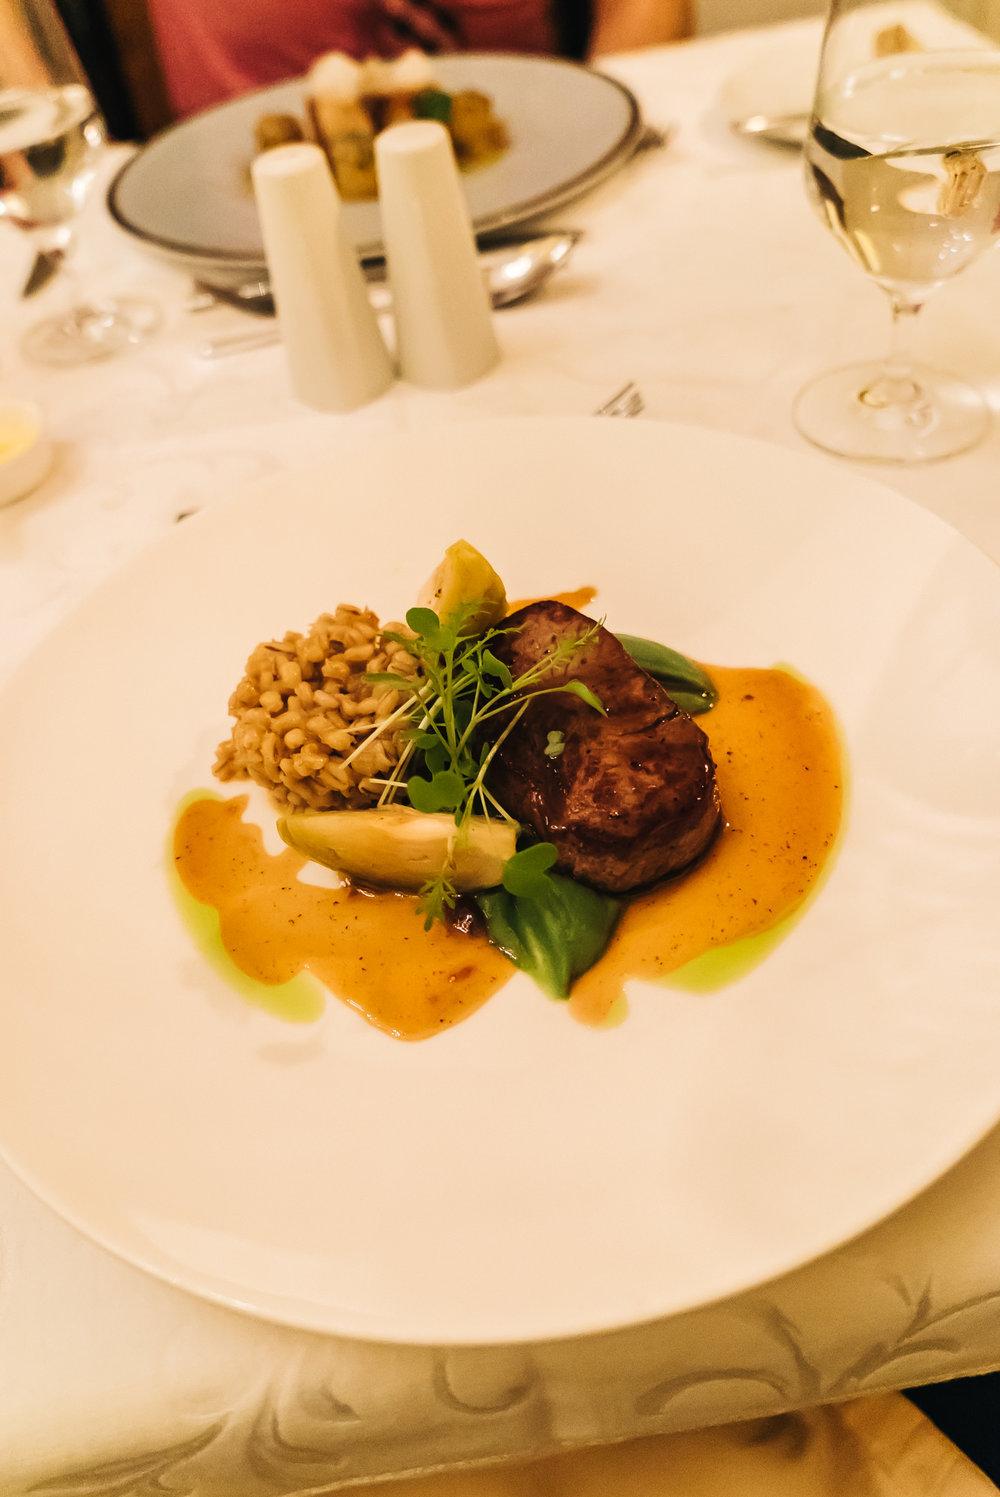 Delicious steak at Halaszbastya Restaurant